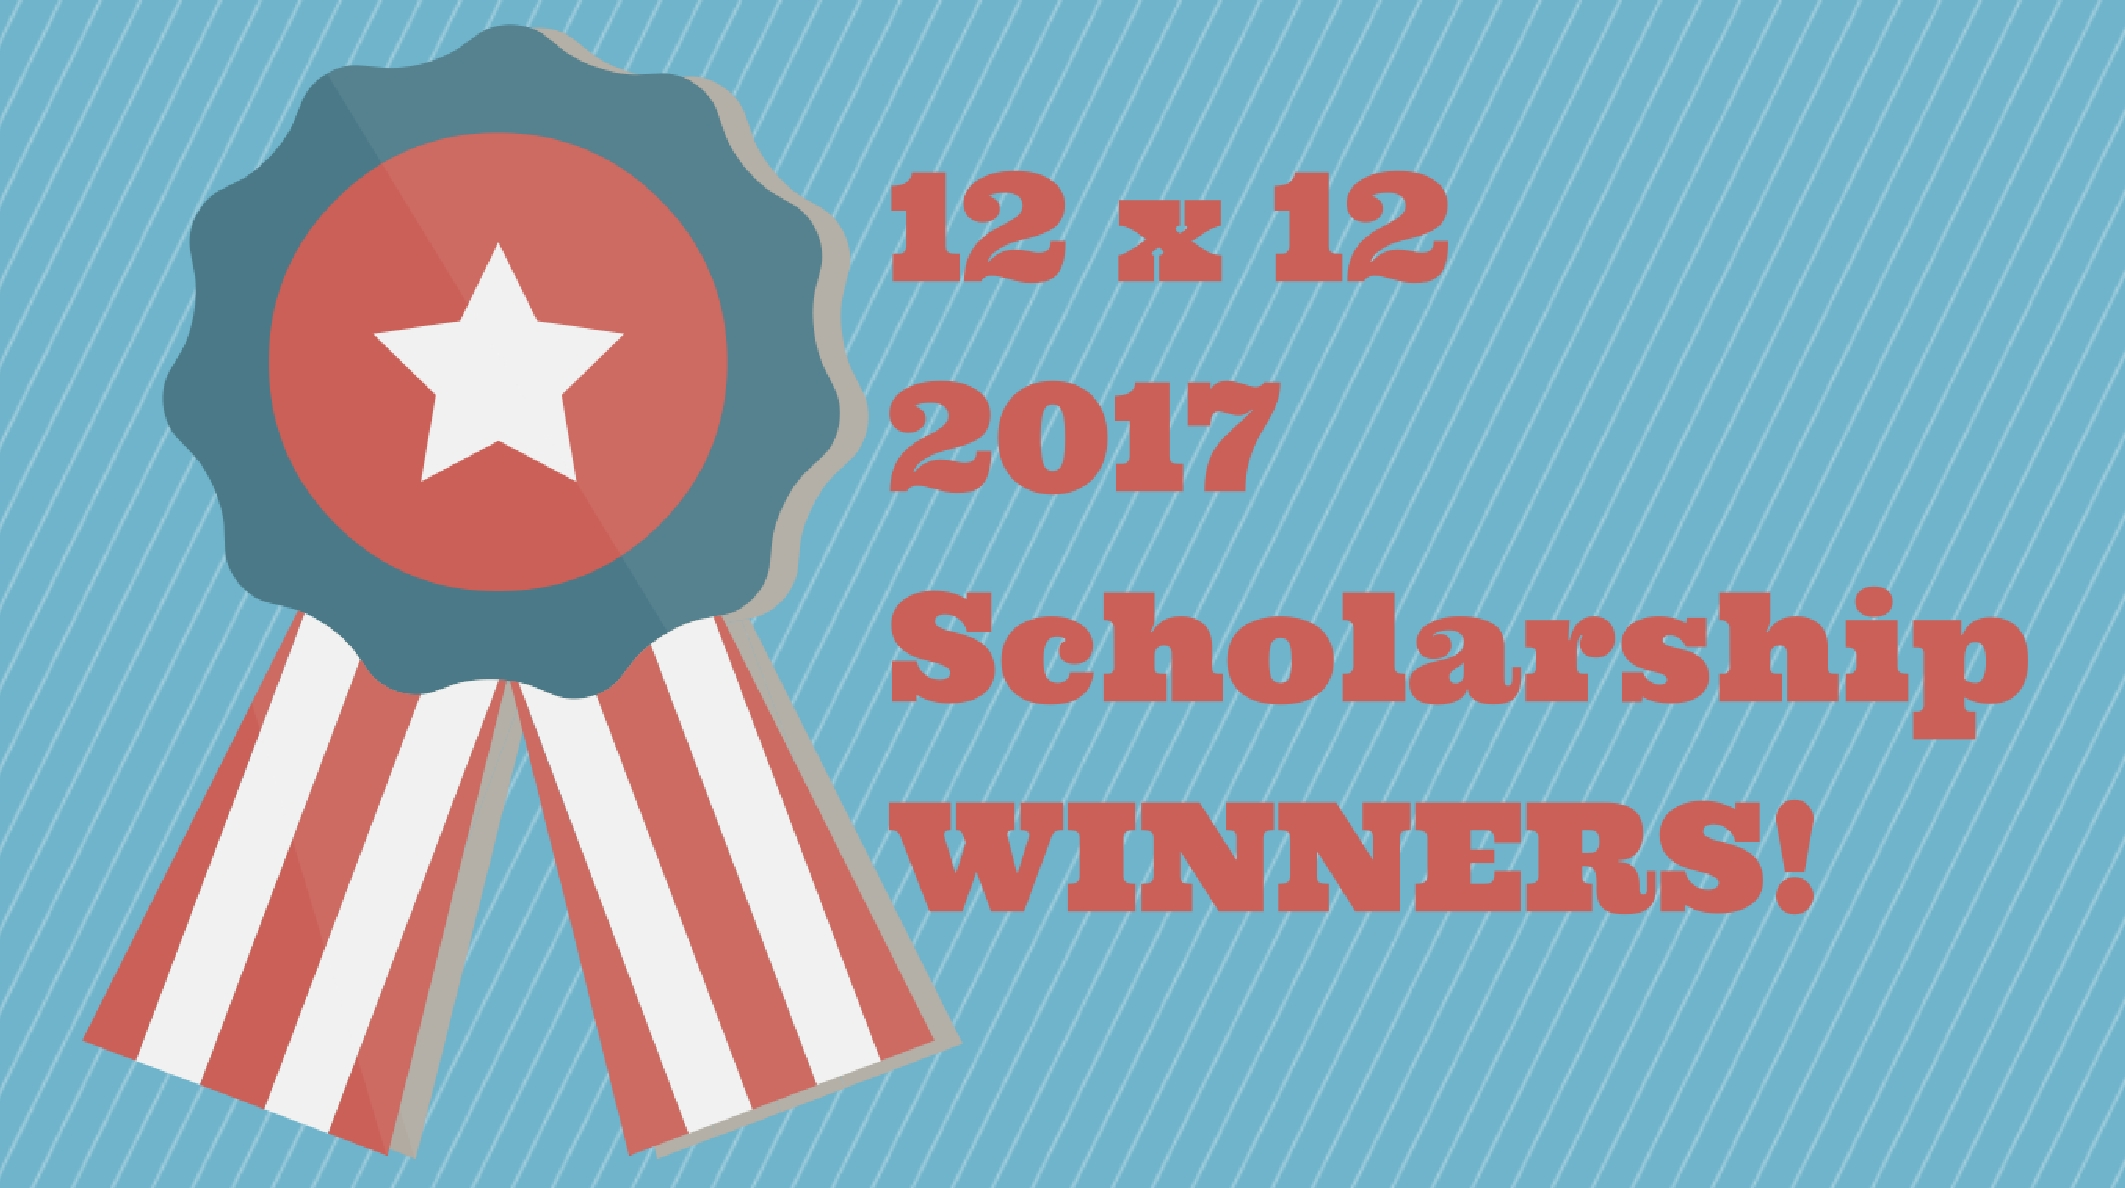 12 X 12 2017 Scholarship Winner